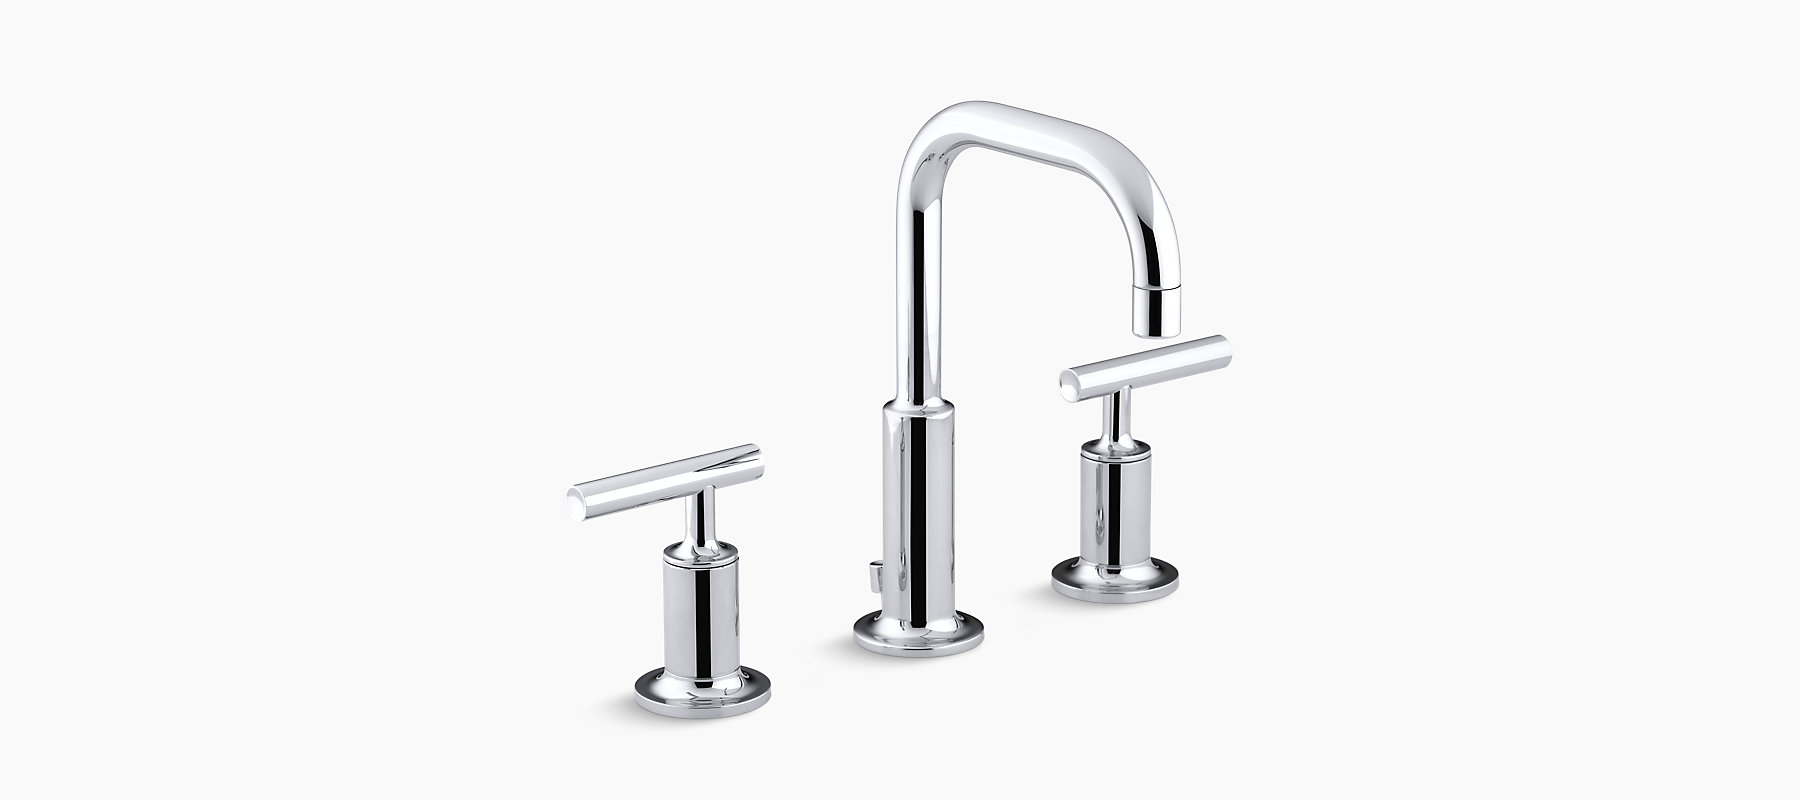 Purist Widespread Lavatory Faucet With Low Gooseneck Spout